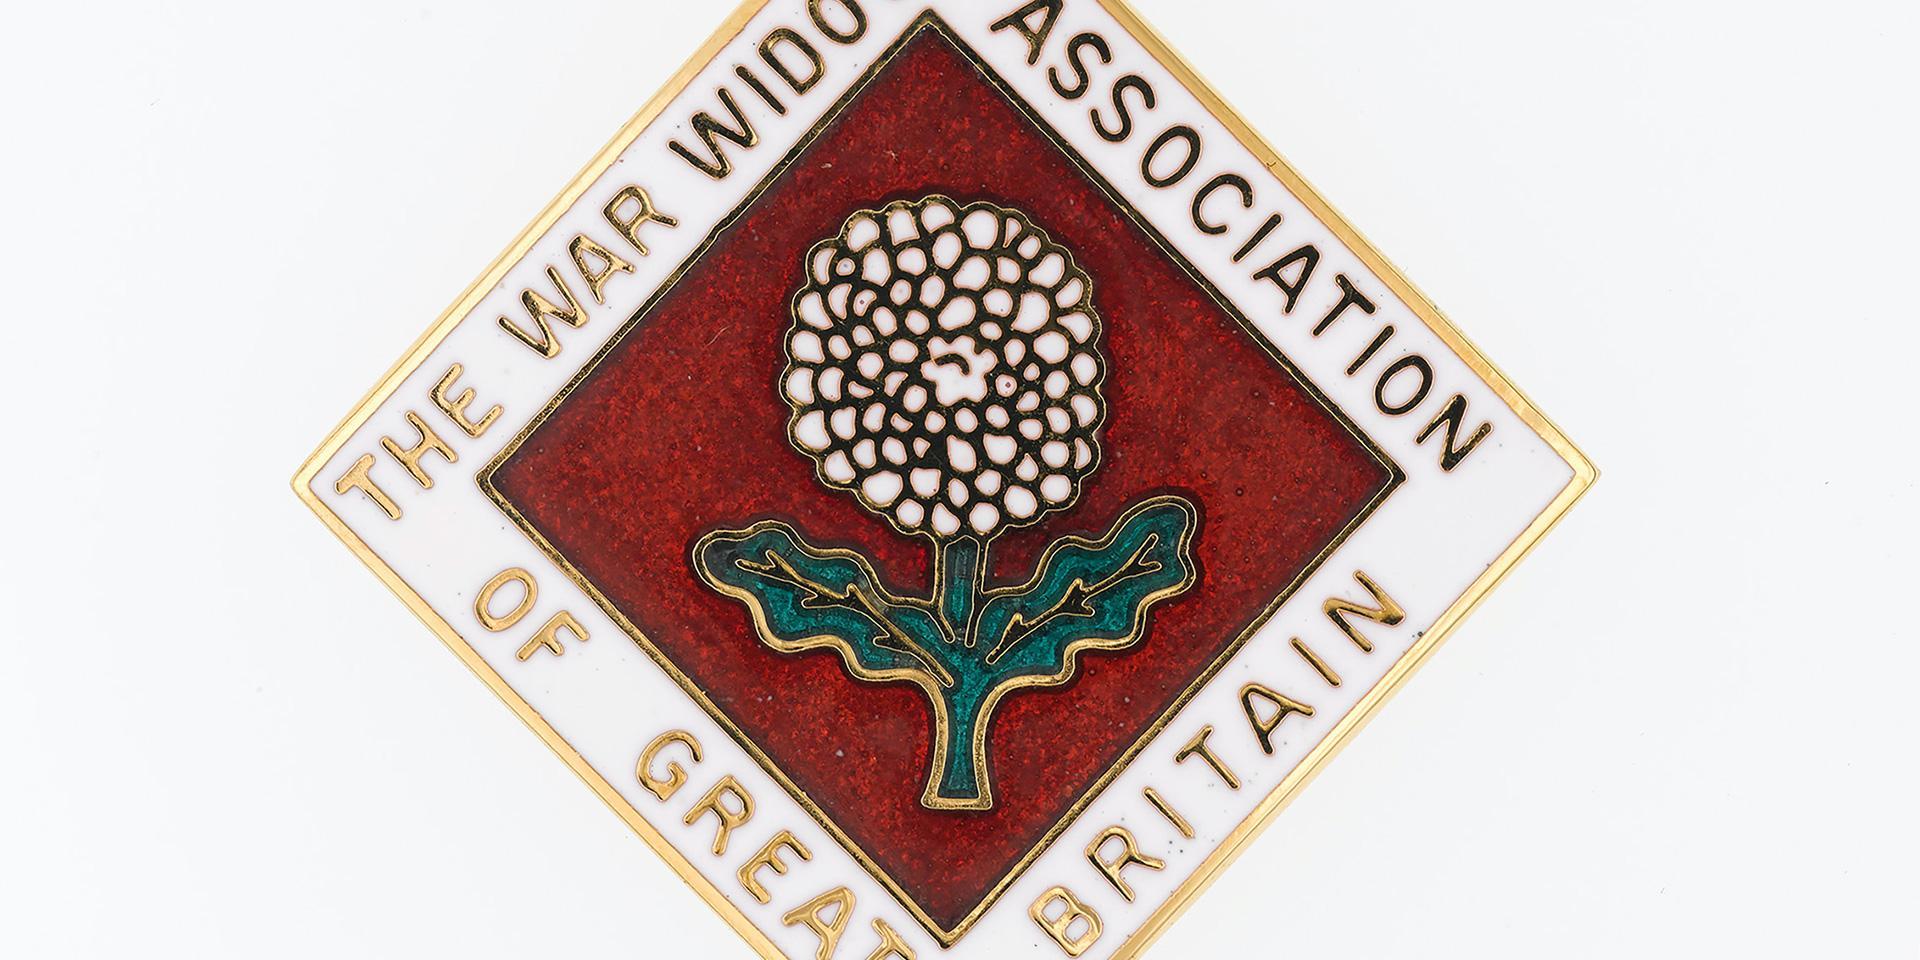 Lapel badge, War Widows Association of Great Britain, 2018